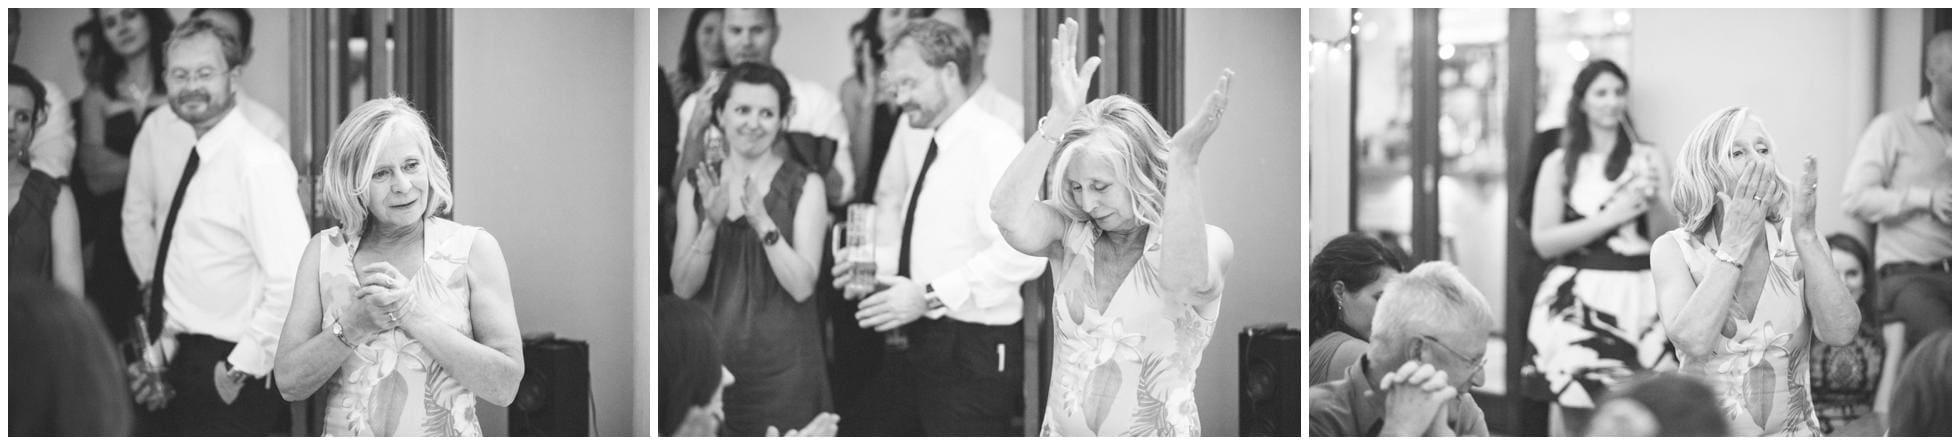 Emotional Mother of the bride giving her Sydney wedding speech